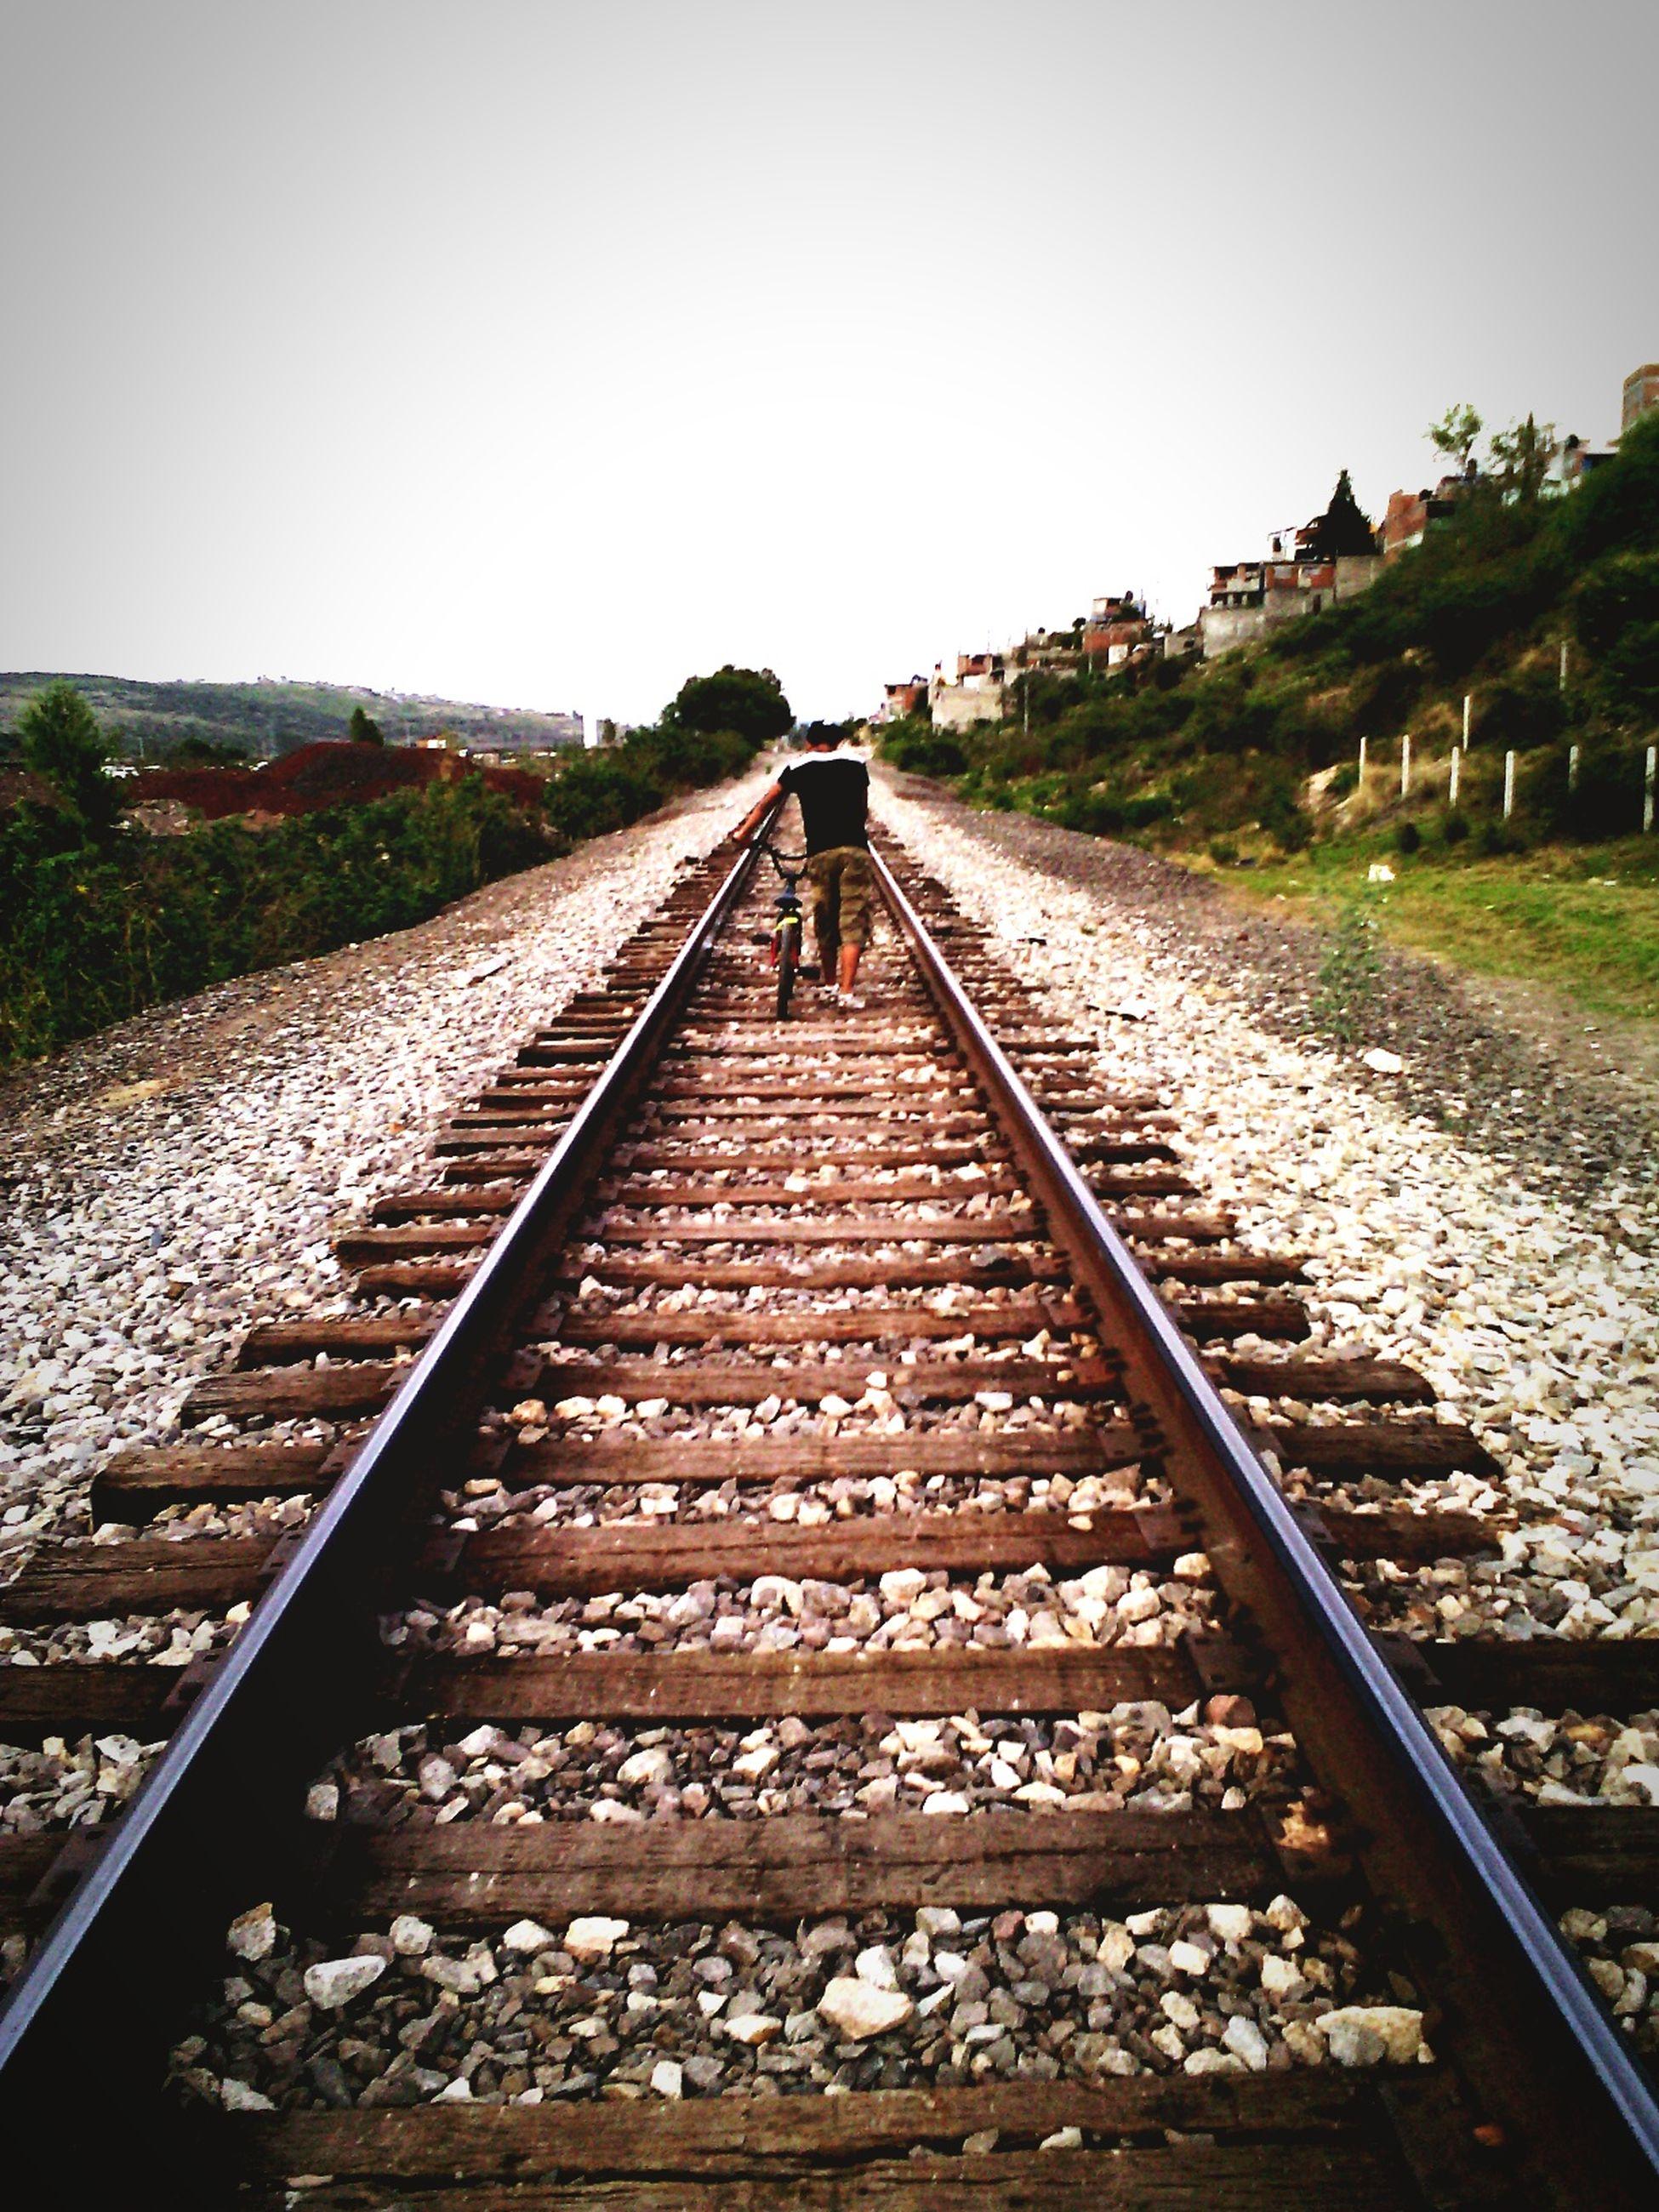 railroad track, rail transportation, transportation, clear sky, diminishing perspective, the way forward, vanishing point, railway track, public transportation, travel, sky, railroad station platform, day, railroad station, gravel, tree, outdoors, straight